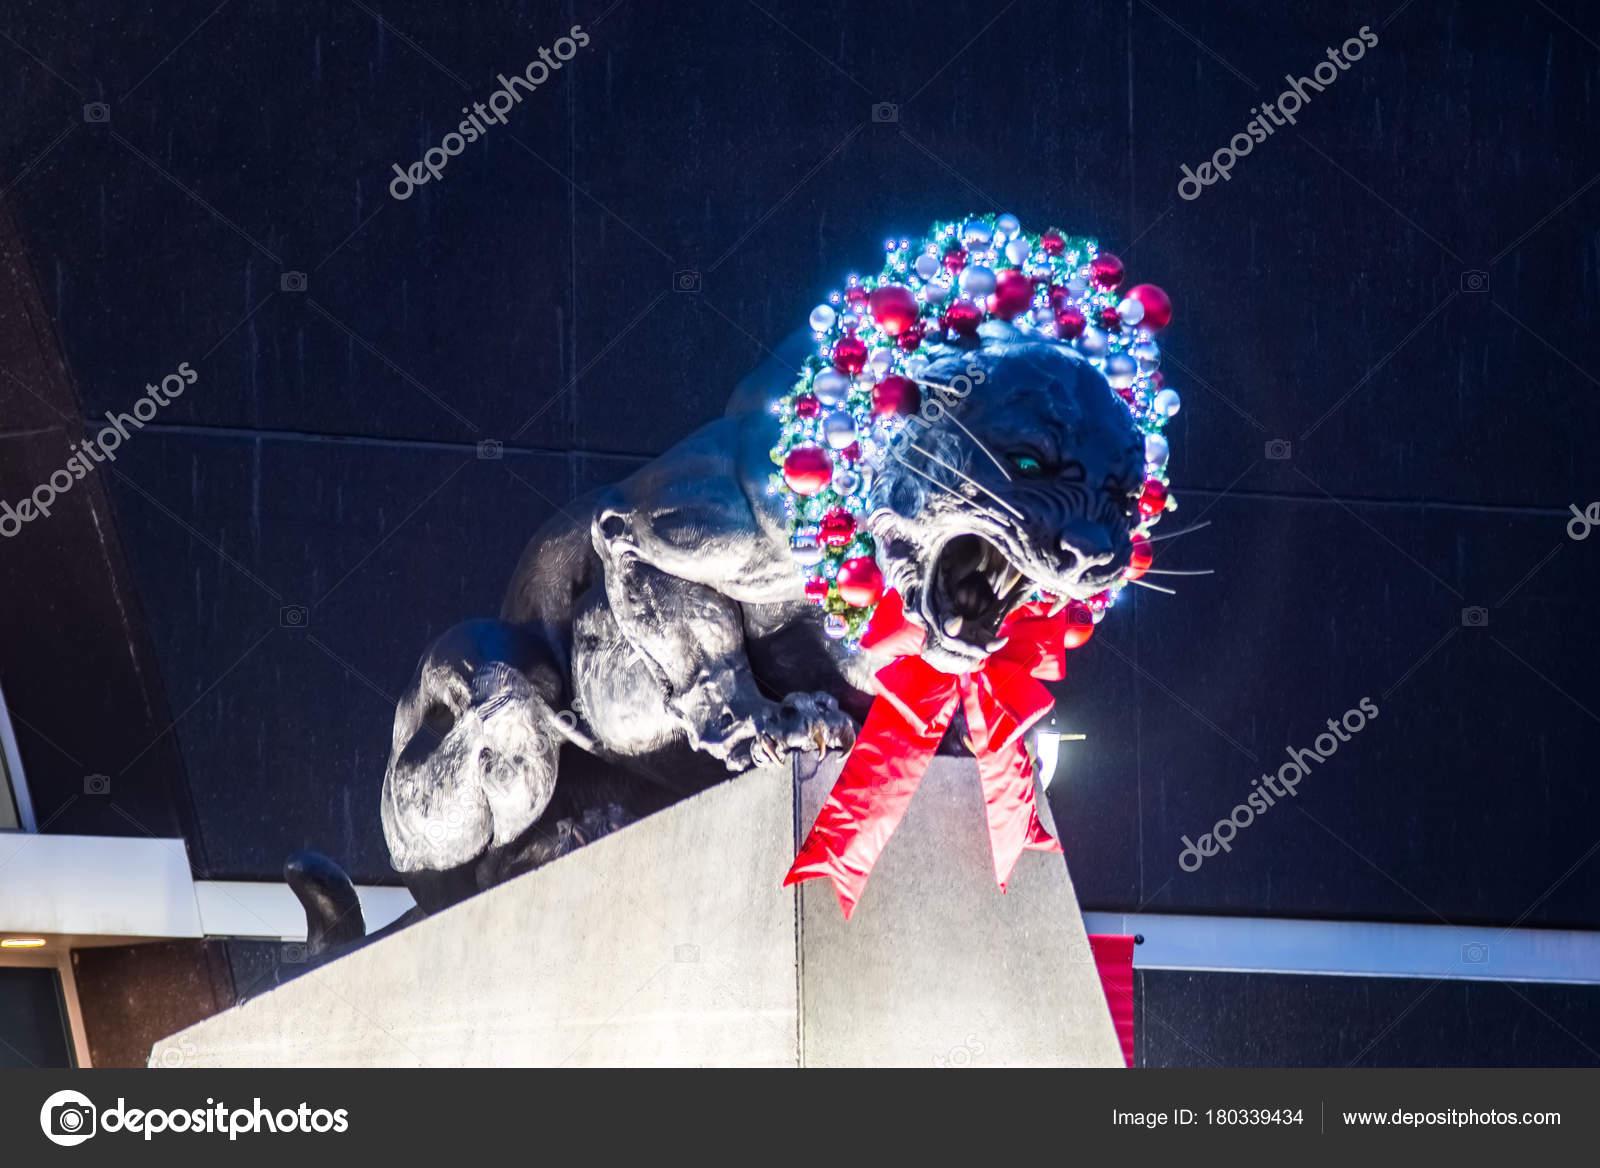 Christmas decorations around carolina panthers stadium in charlotte nc– stock image